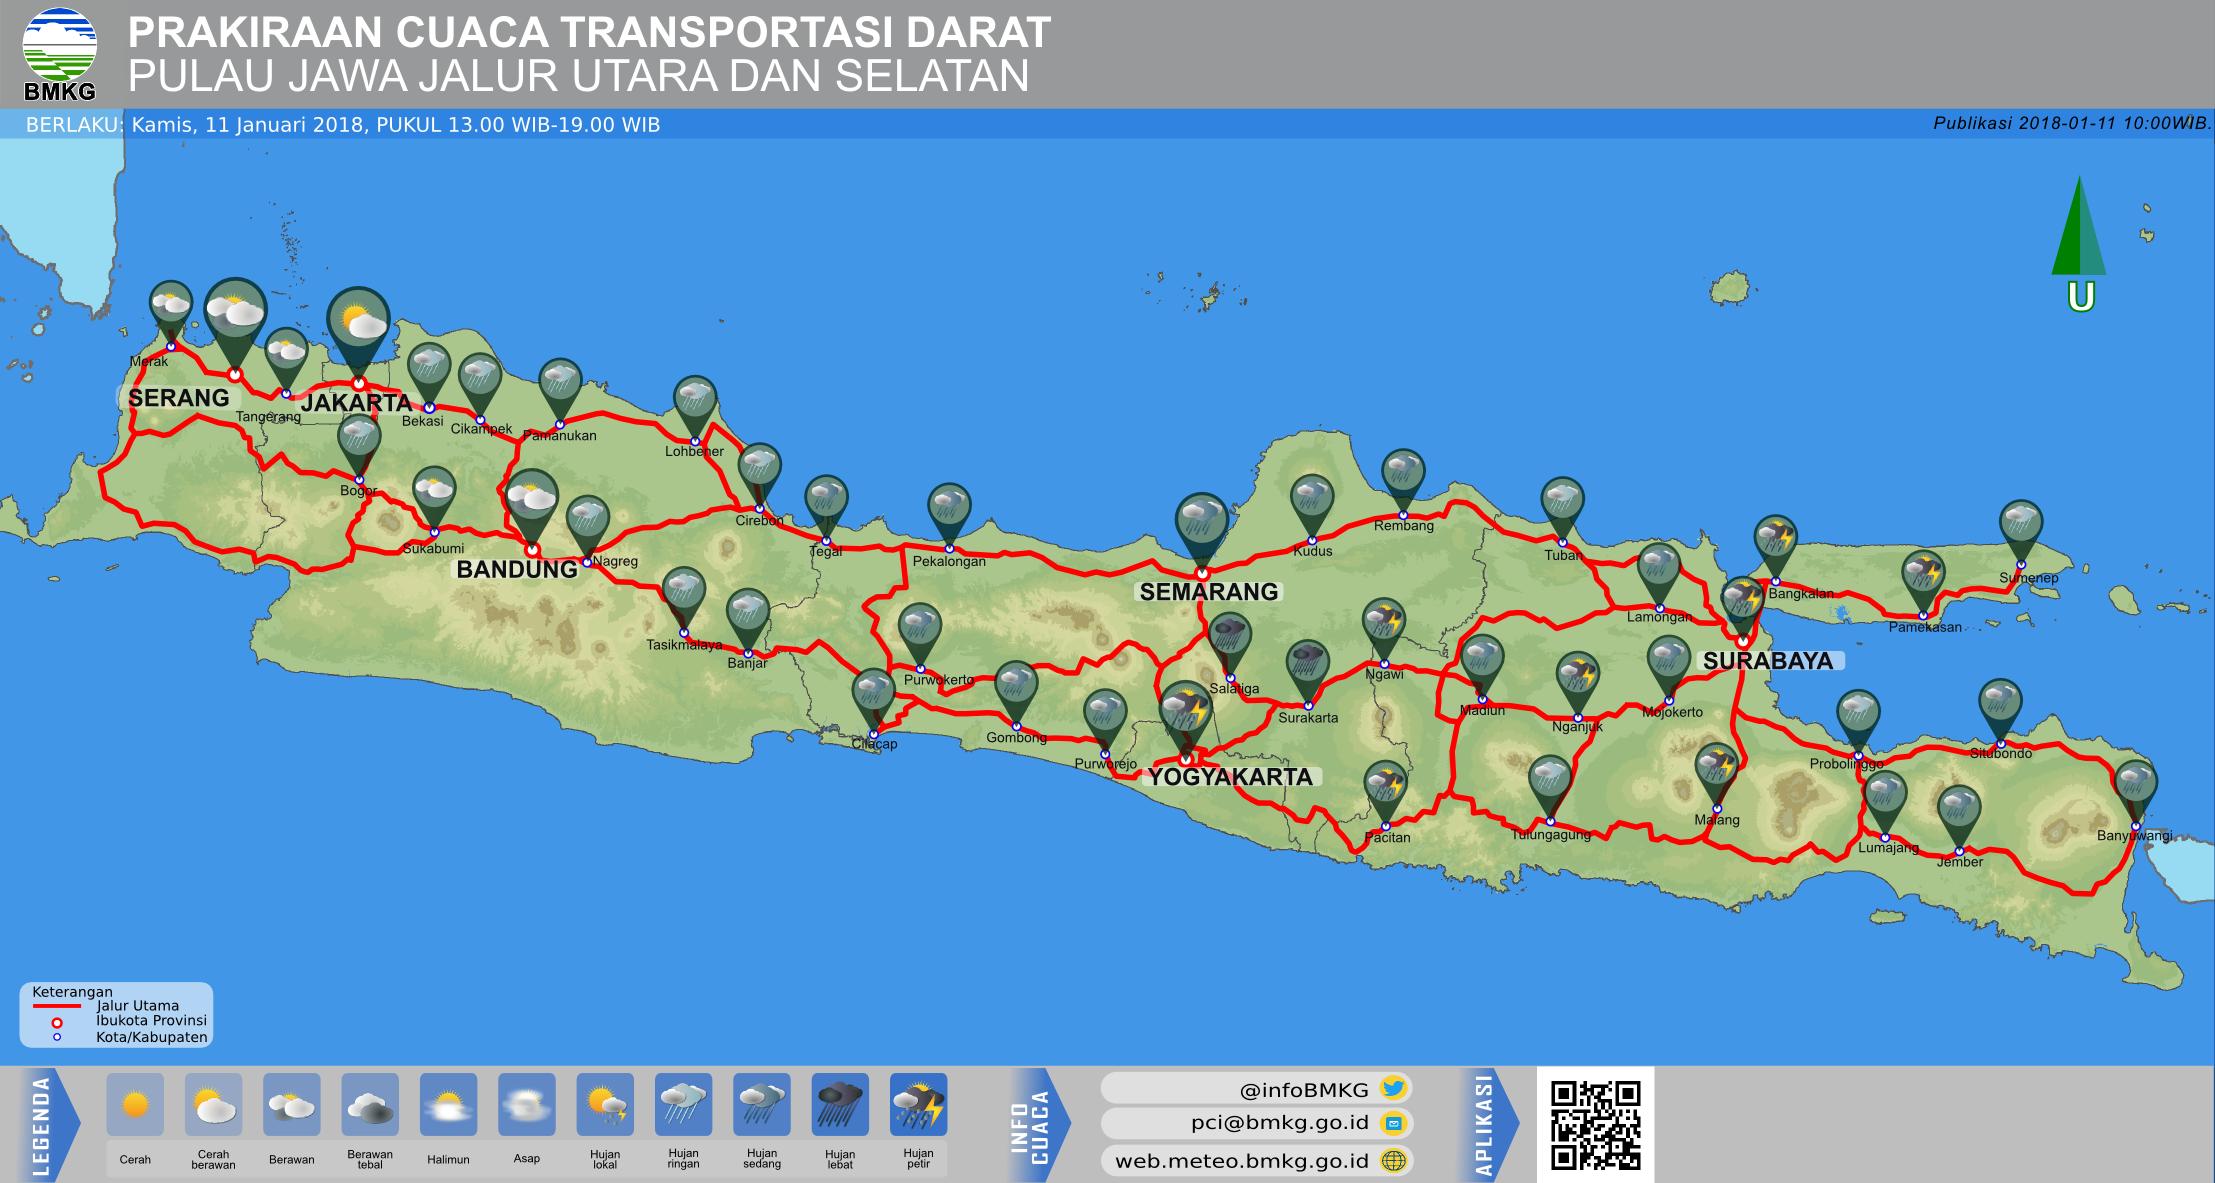 Prakiraan Cuaca Transportasi Darat Jawa Jalur Utara dan Selatan Hari Ini - Siang Hari Pukul 13.00 WIB - Malam Hari Pukul 19.00 WIB